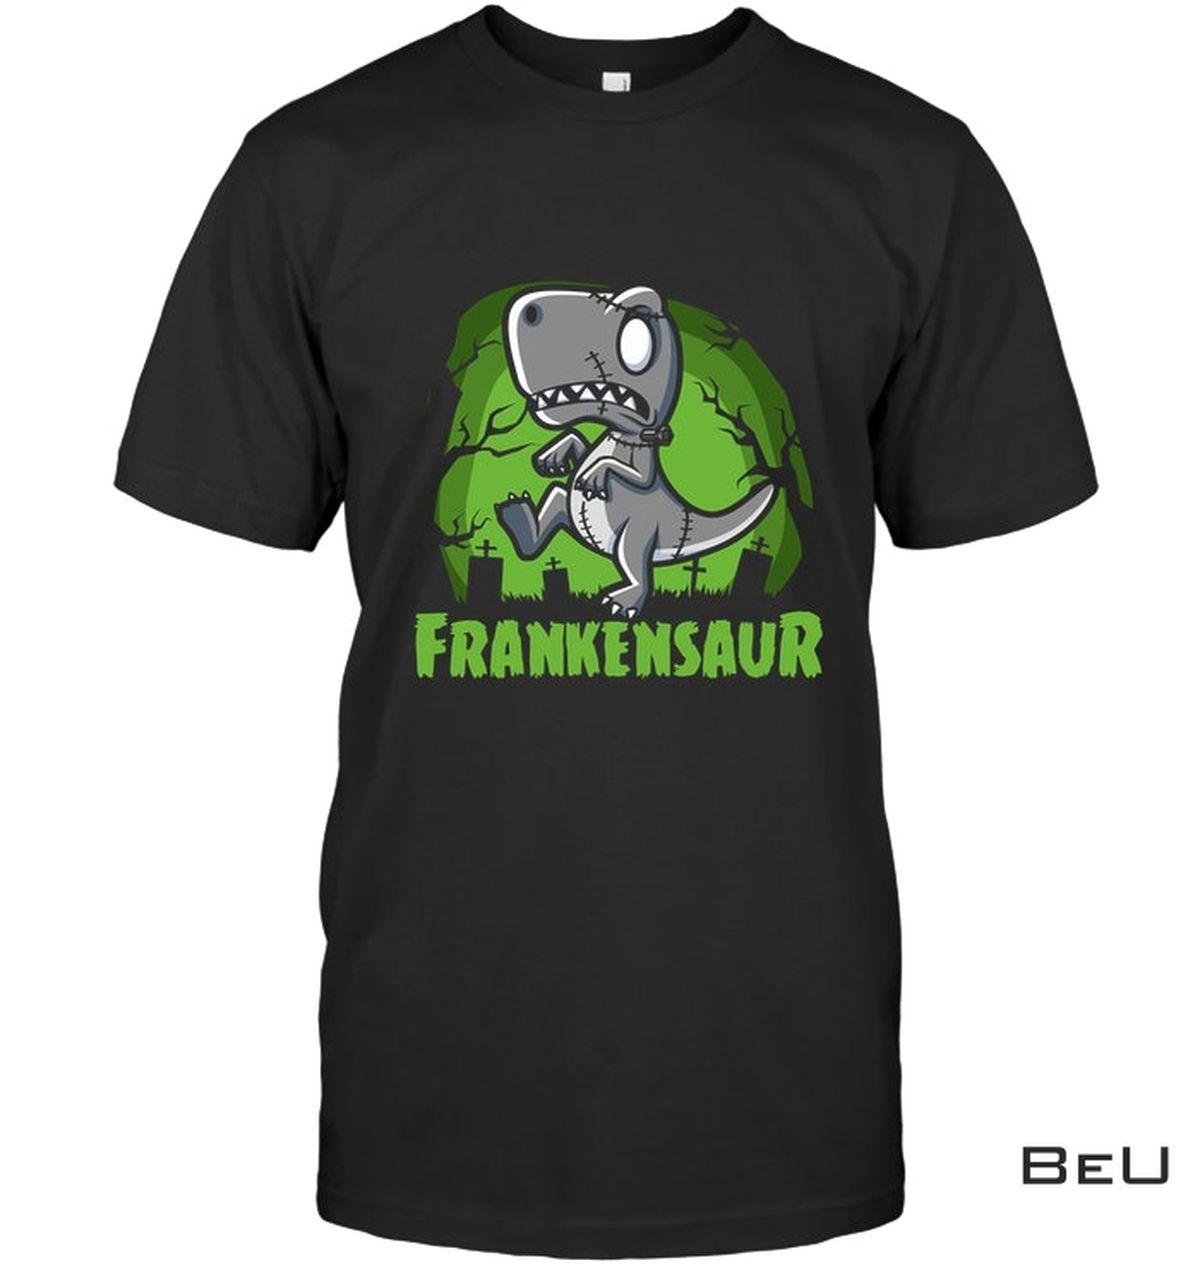 Frankensaur Shirt